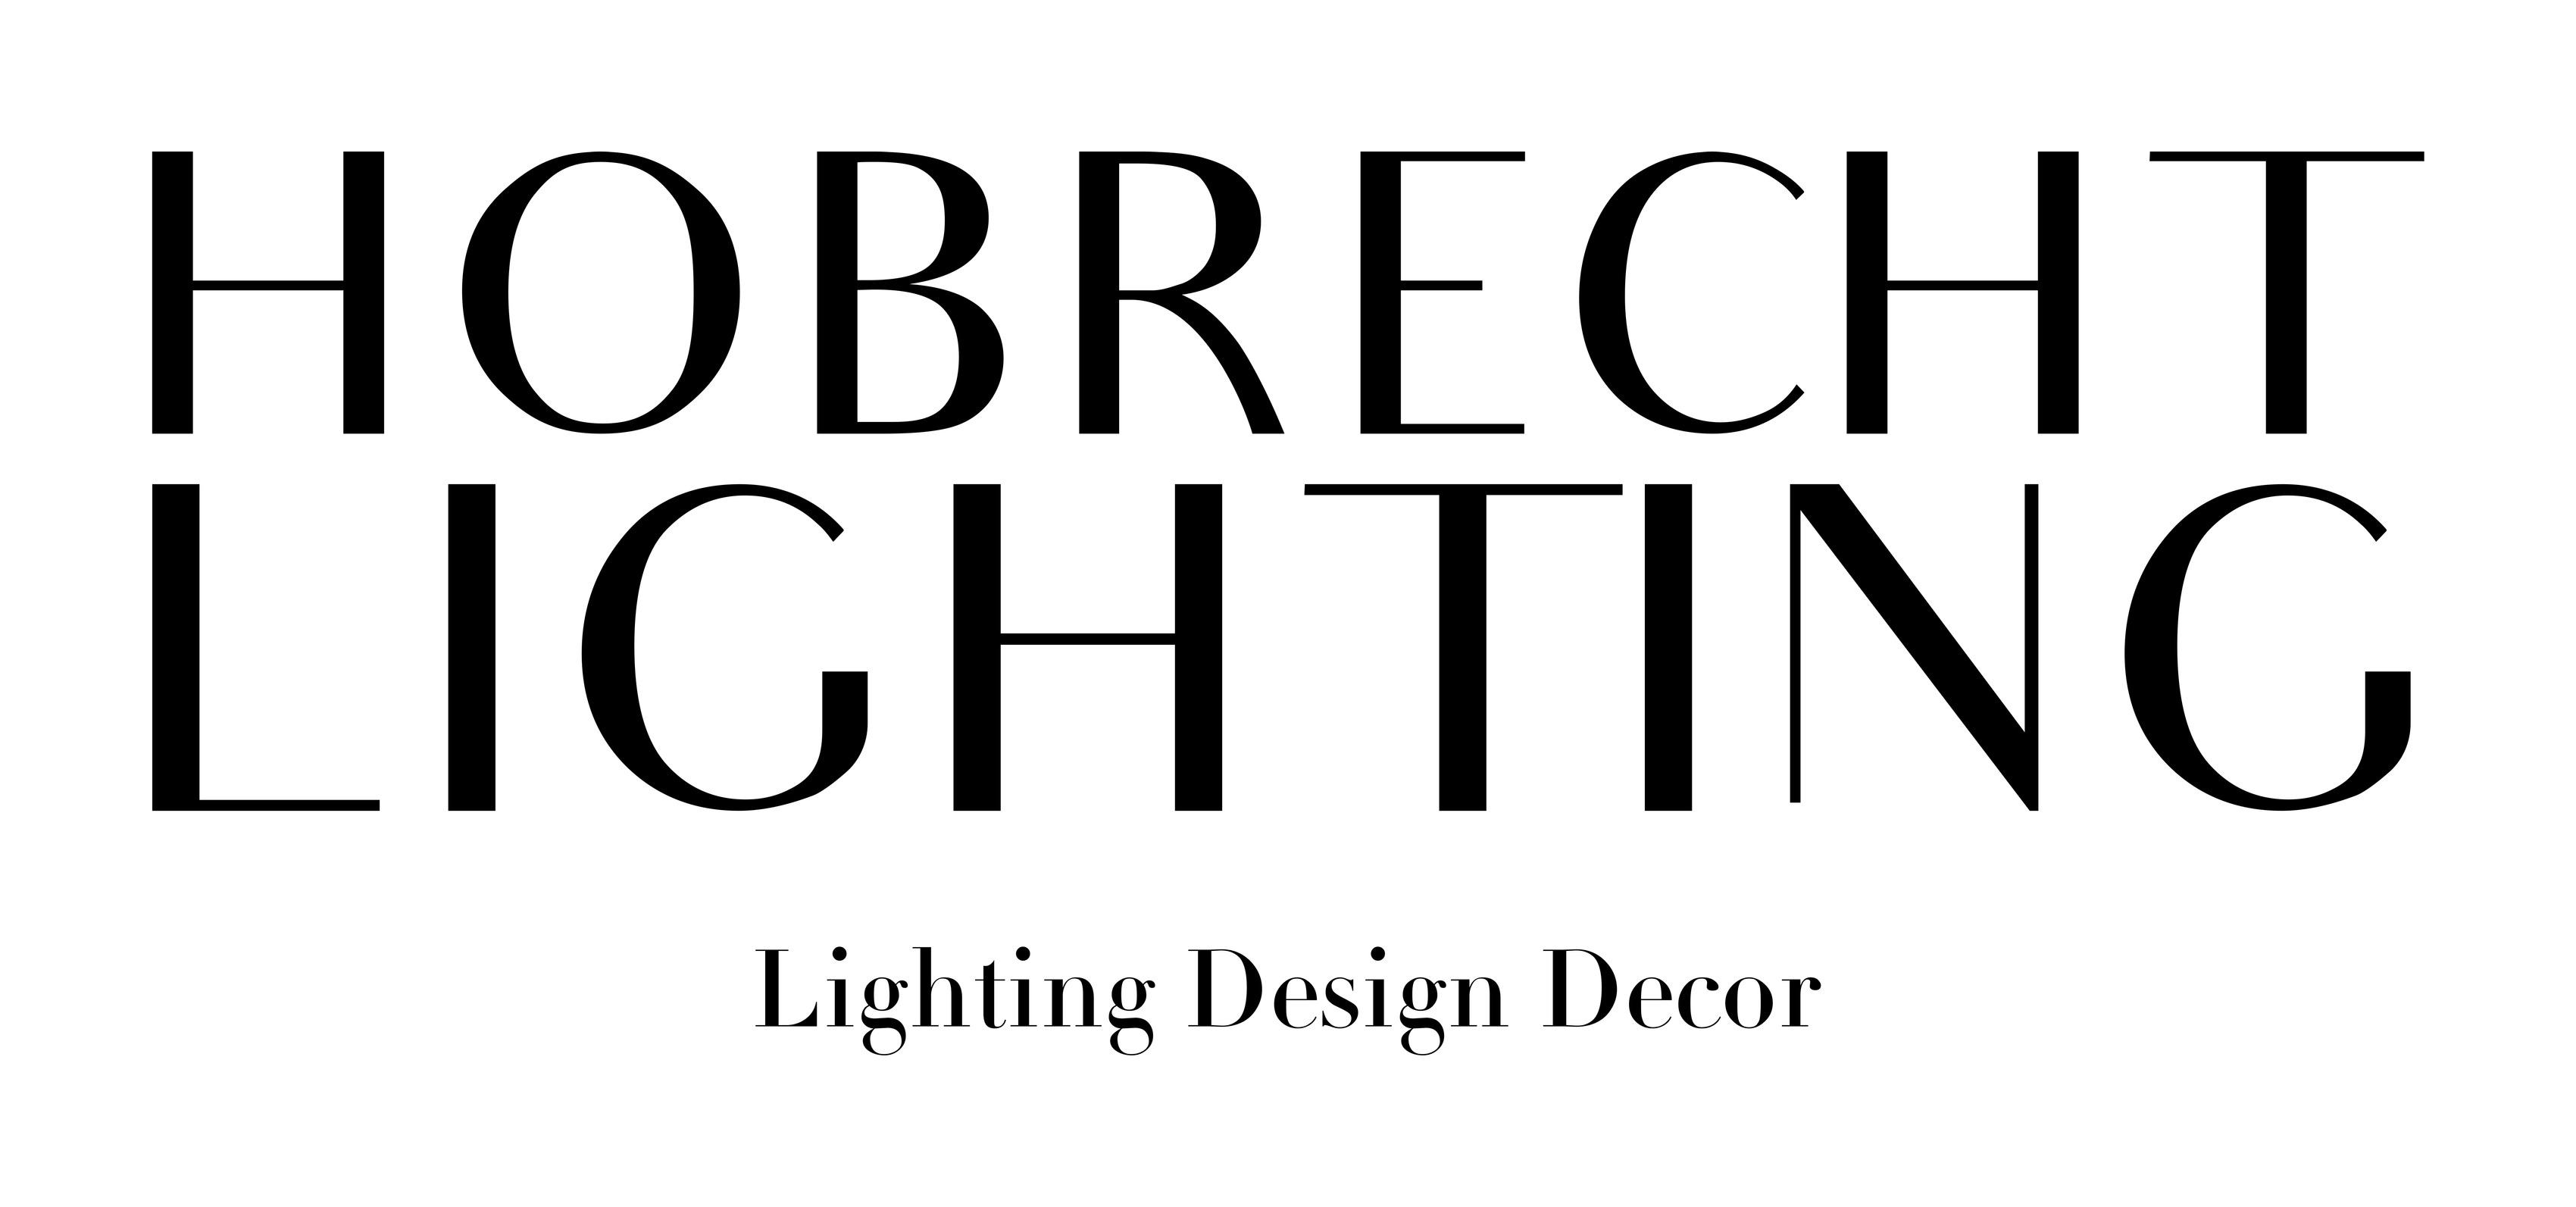 hobrecht lighting sacramento lighting